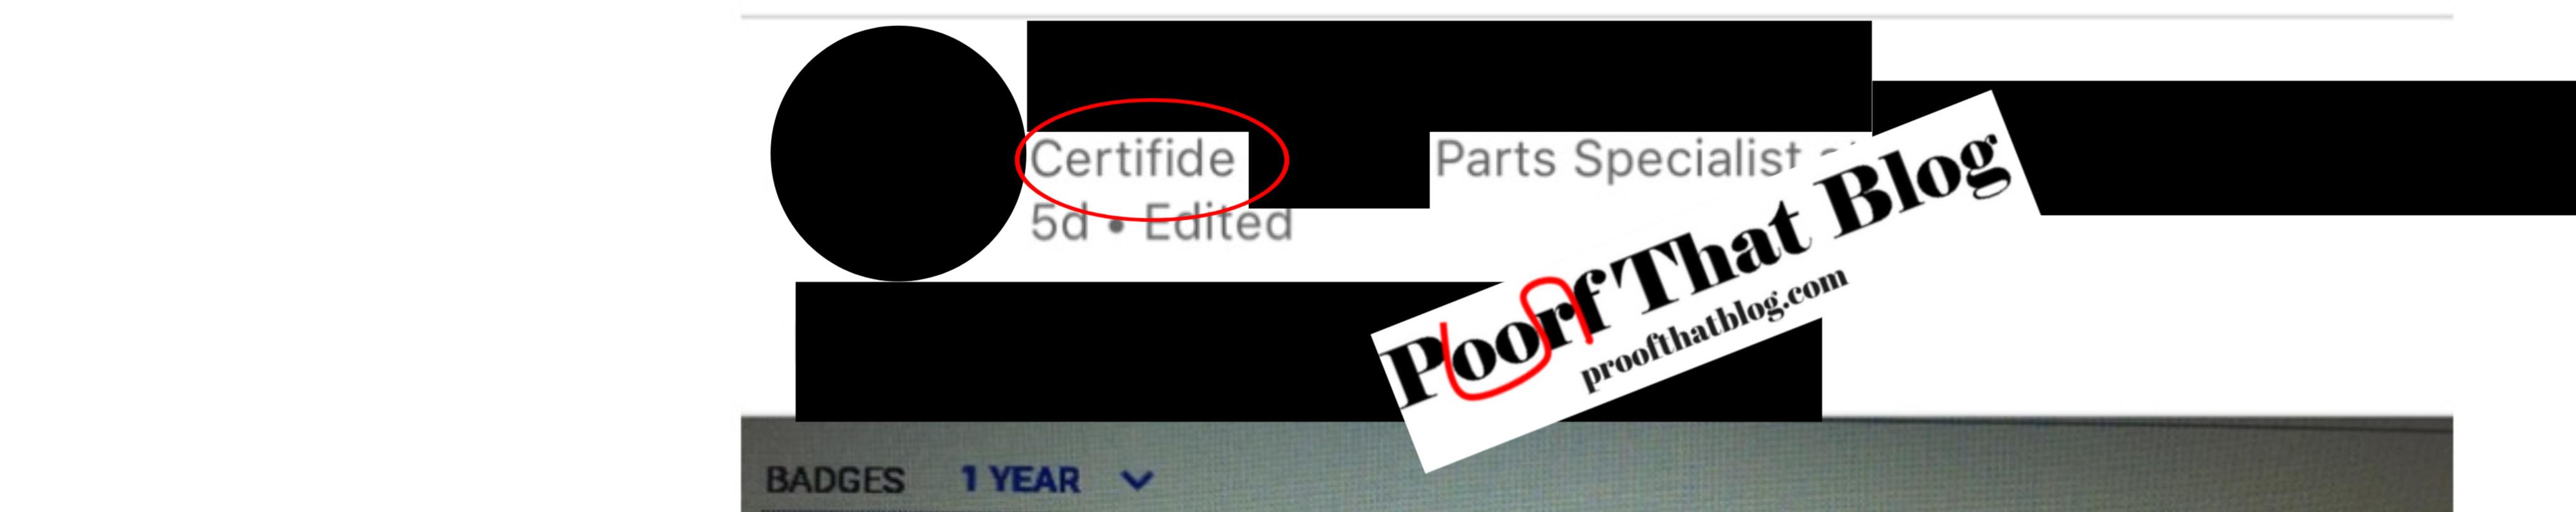 Certifide2